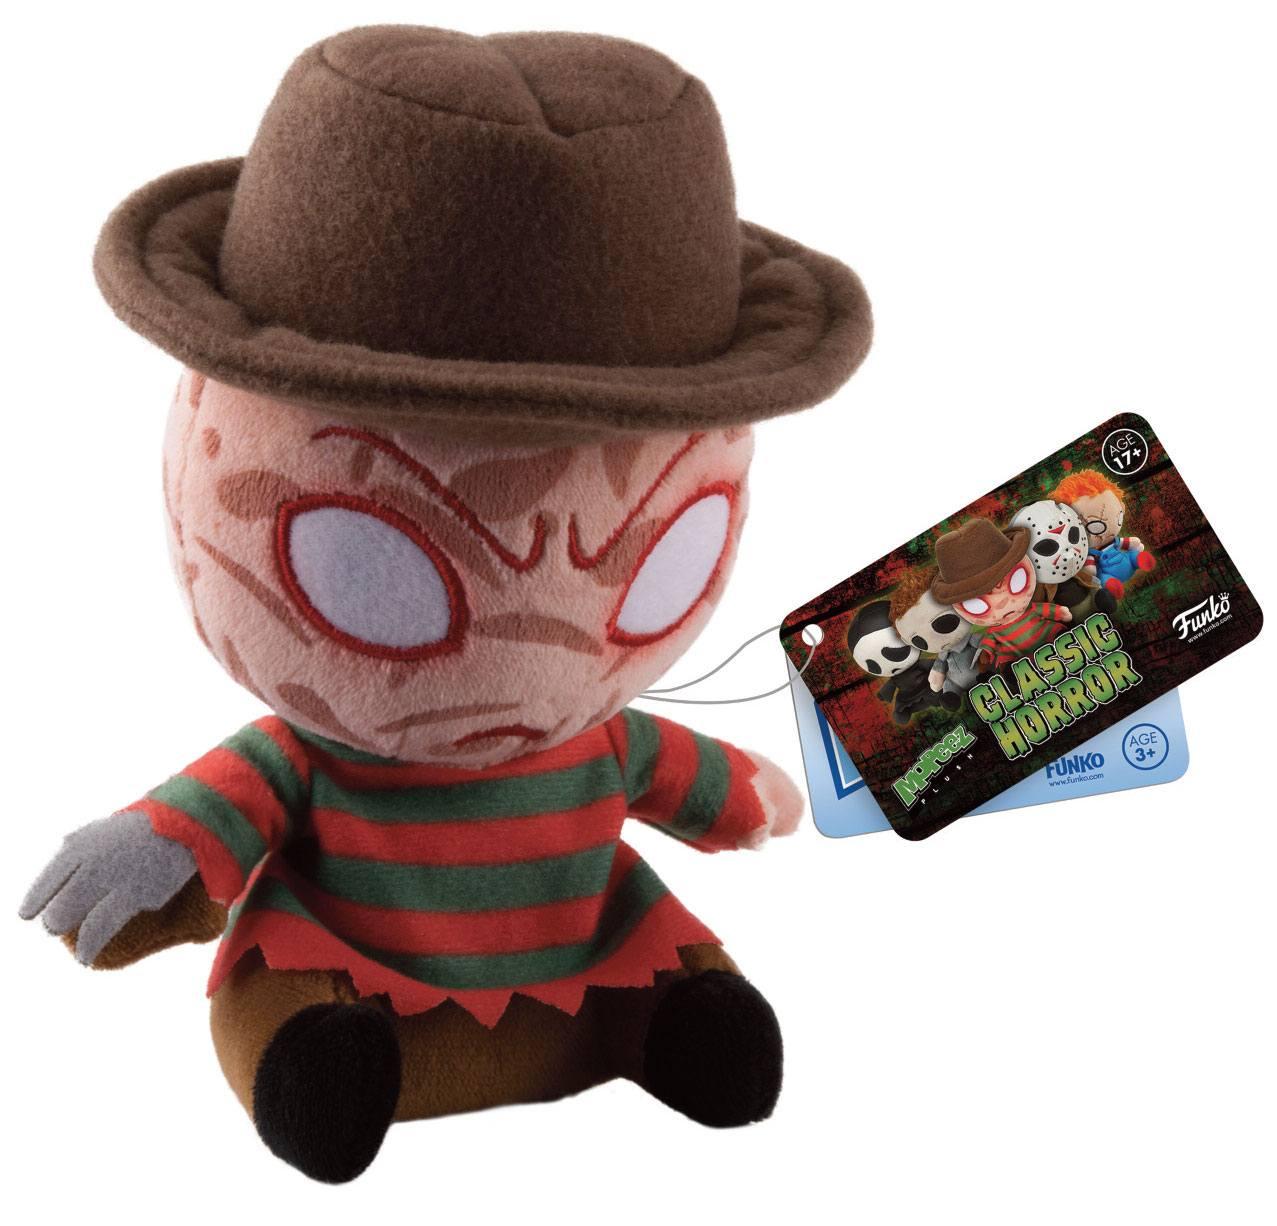 Nightmare on Elm Street Horror Classics Mopeez Plush Figure Freddy Krueger 12 cm